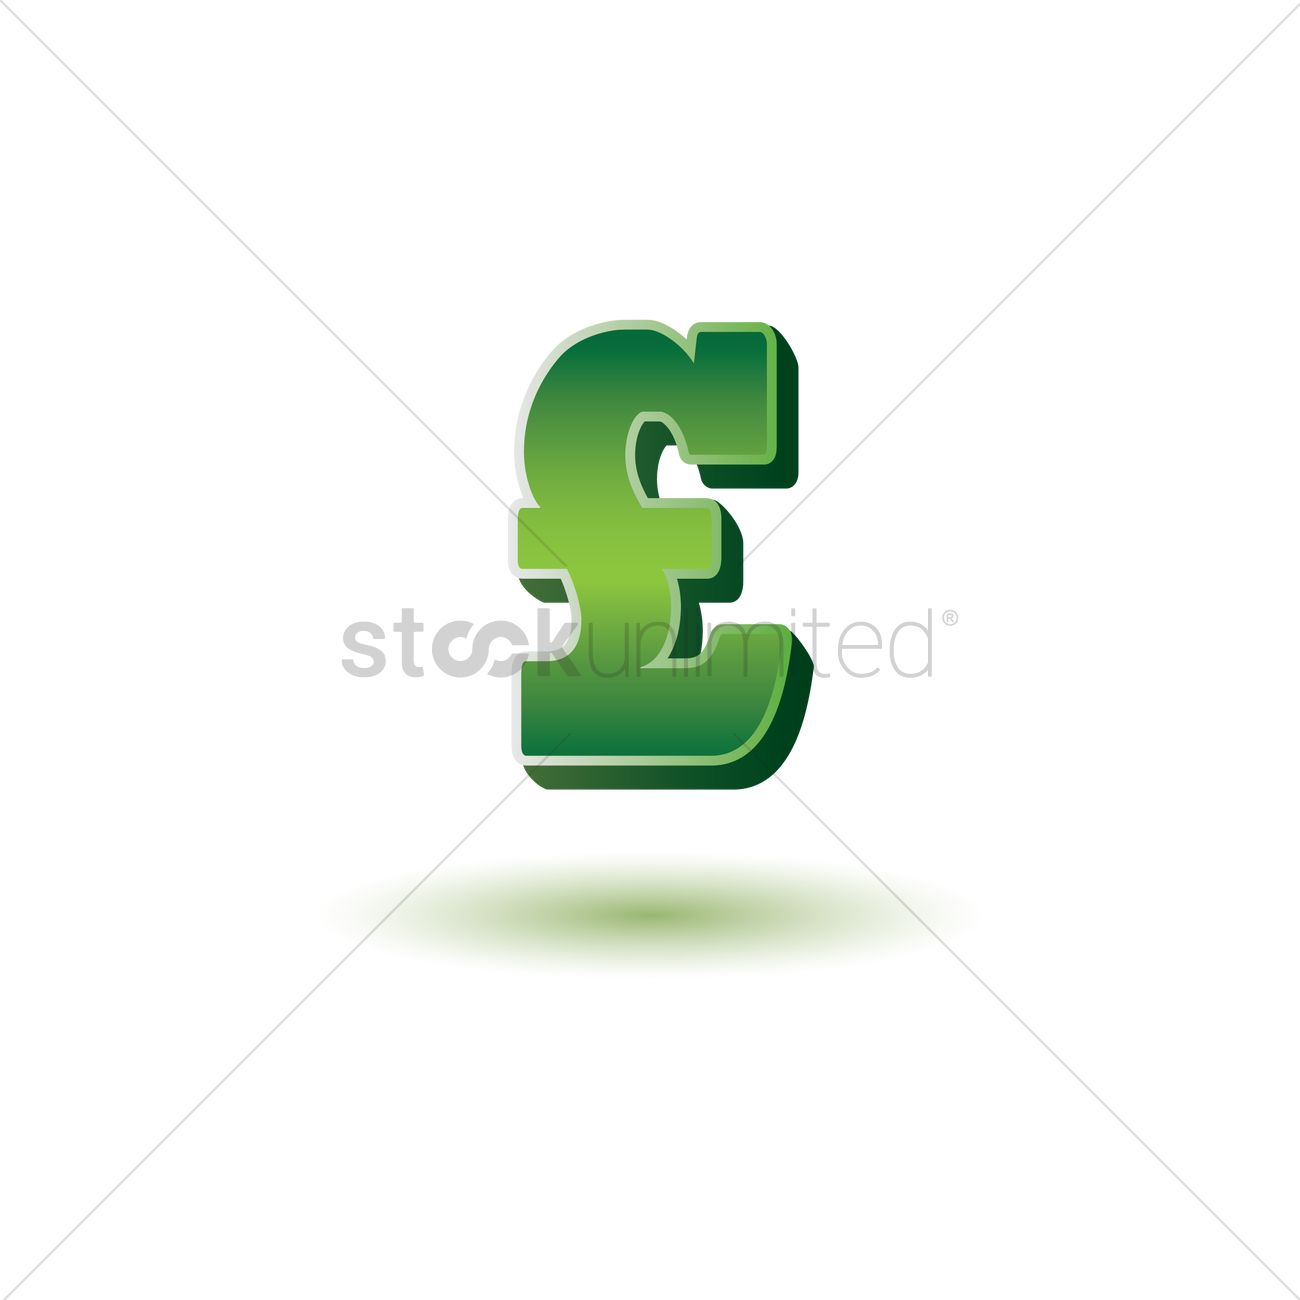 Uk Pound Sterling Symbol Vector Image 1870796 Stockunlimited